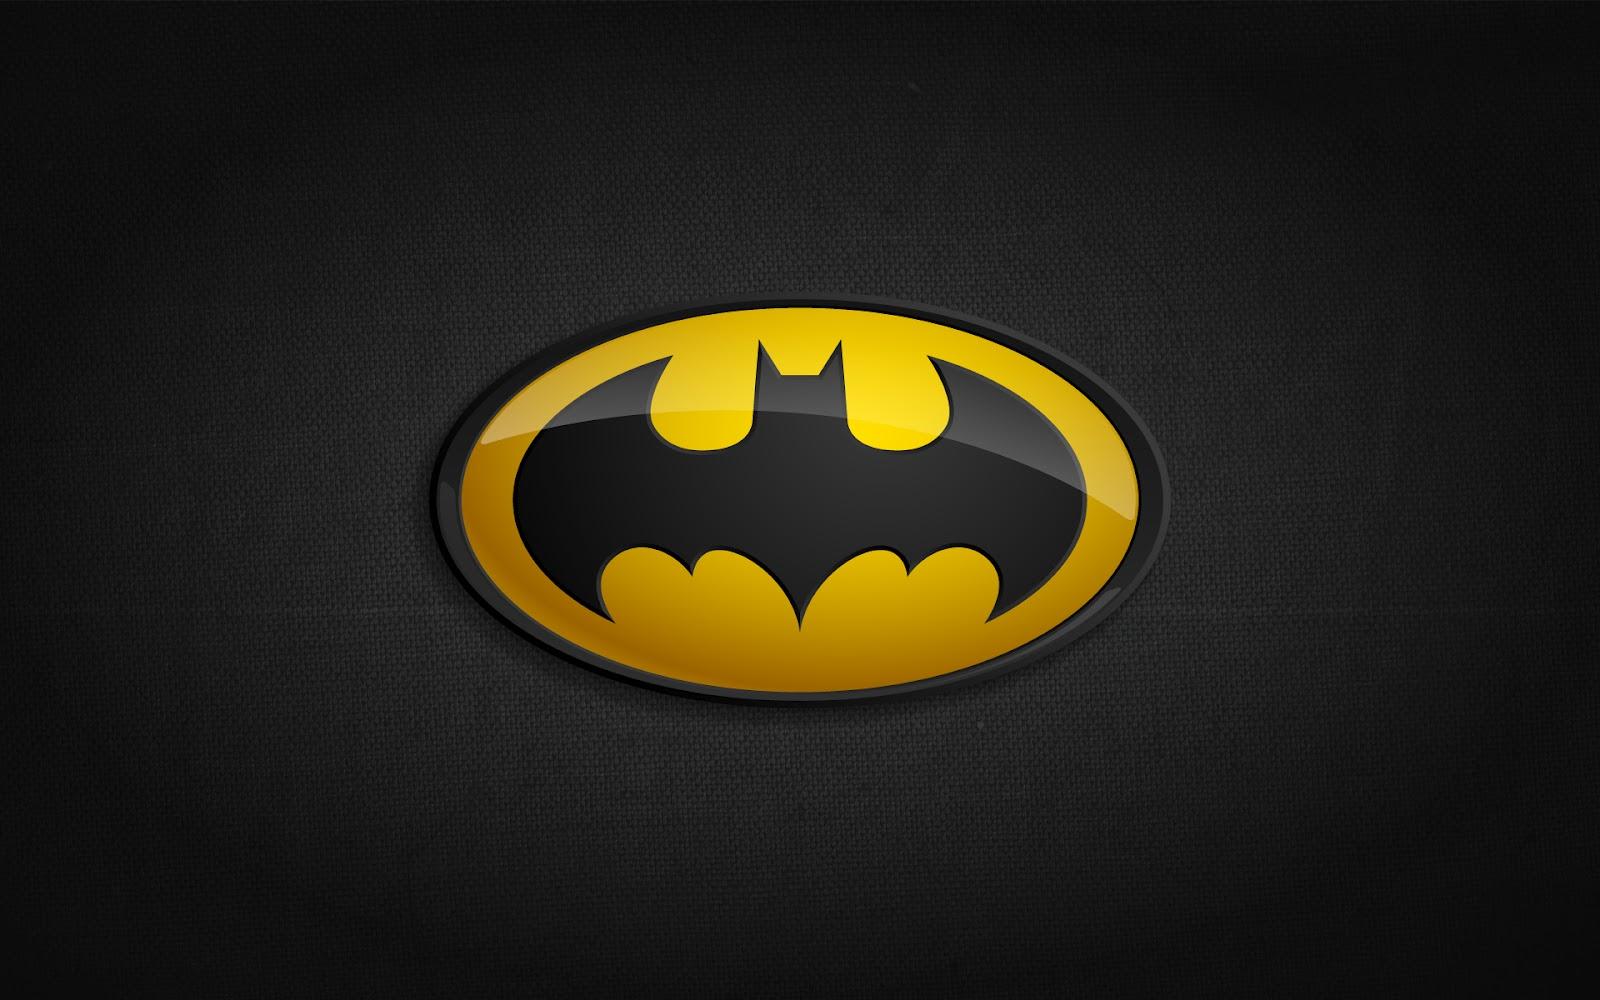 30+ Best Batman Wallpapers - Widescreen